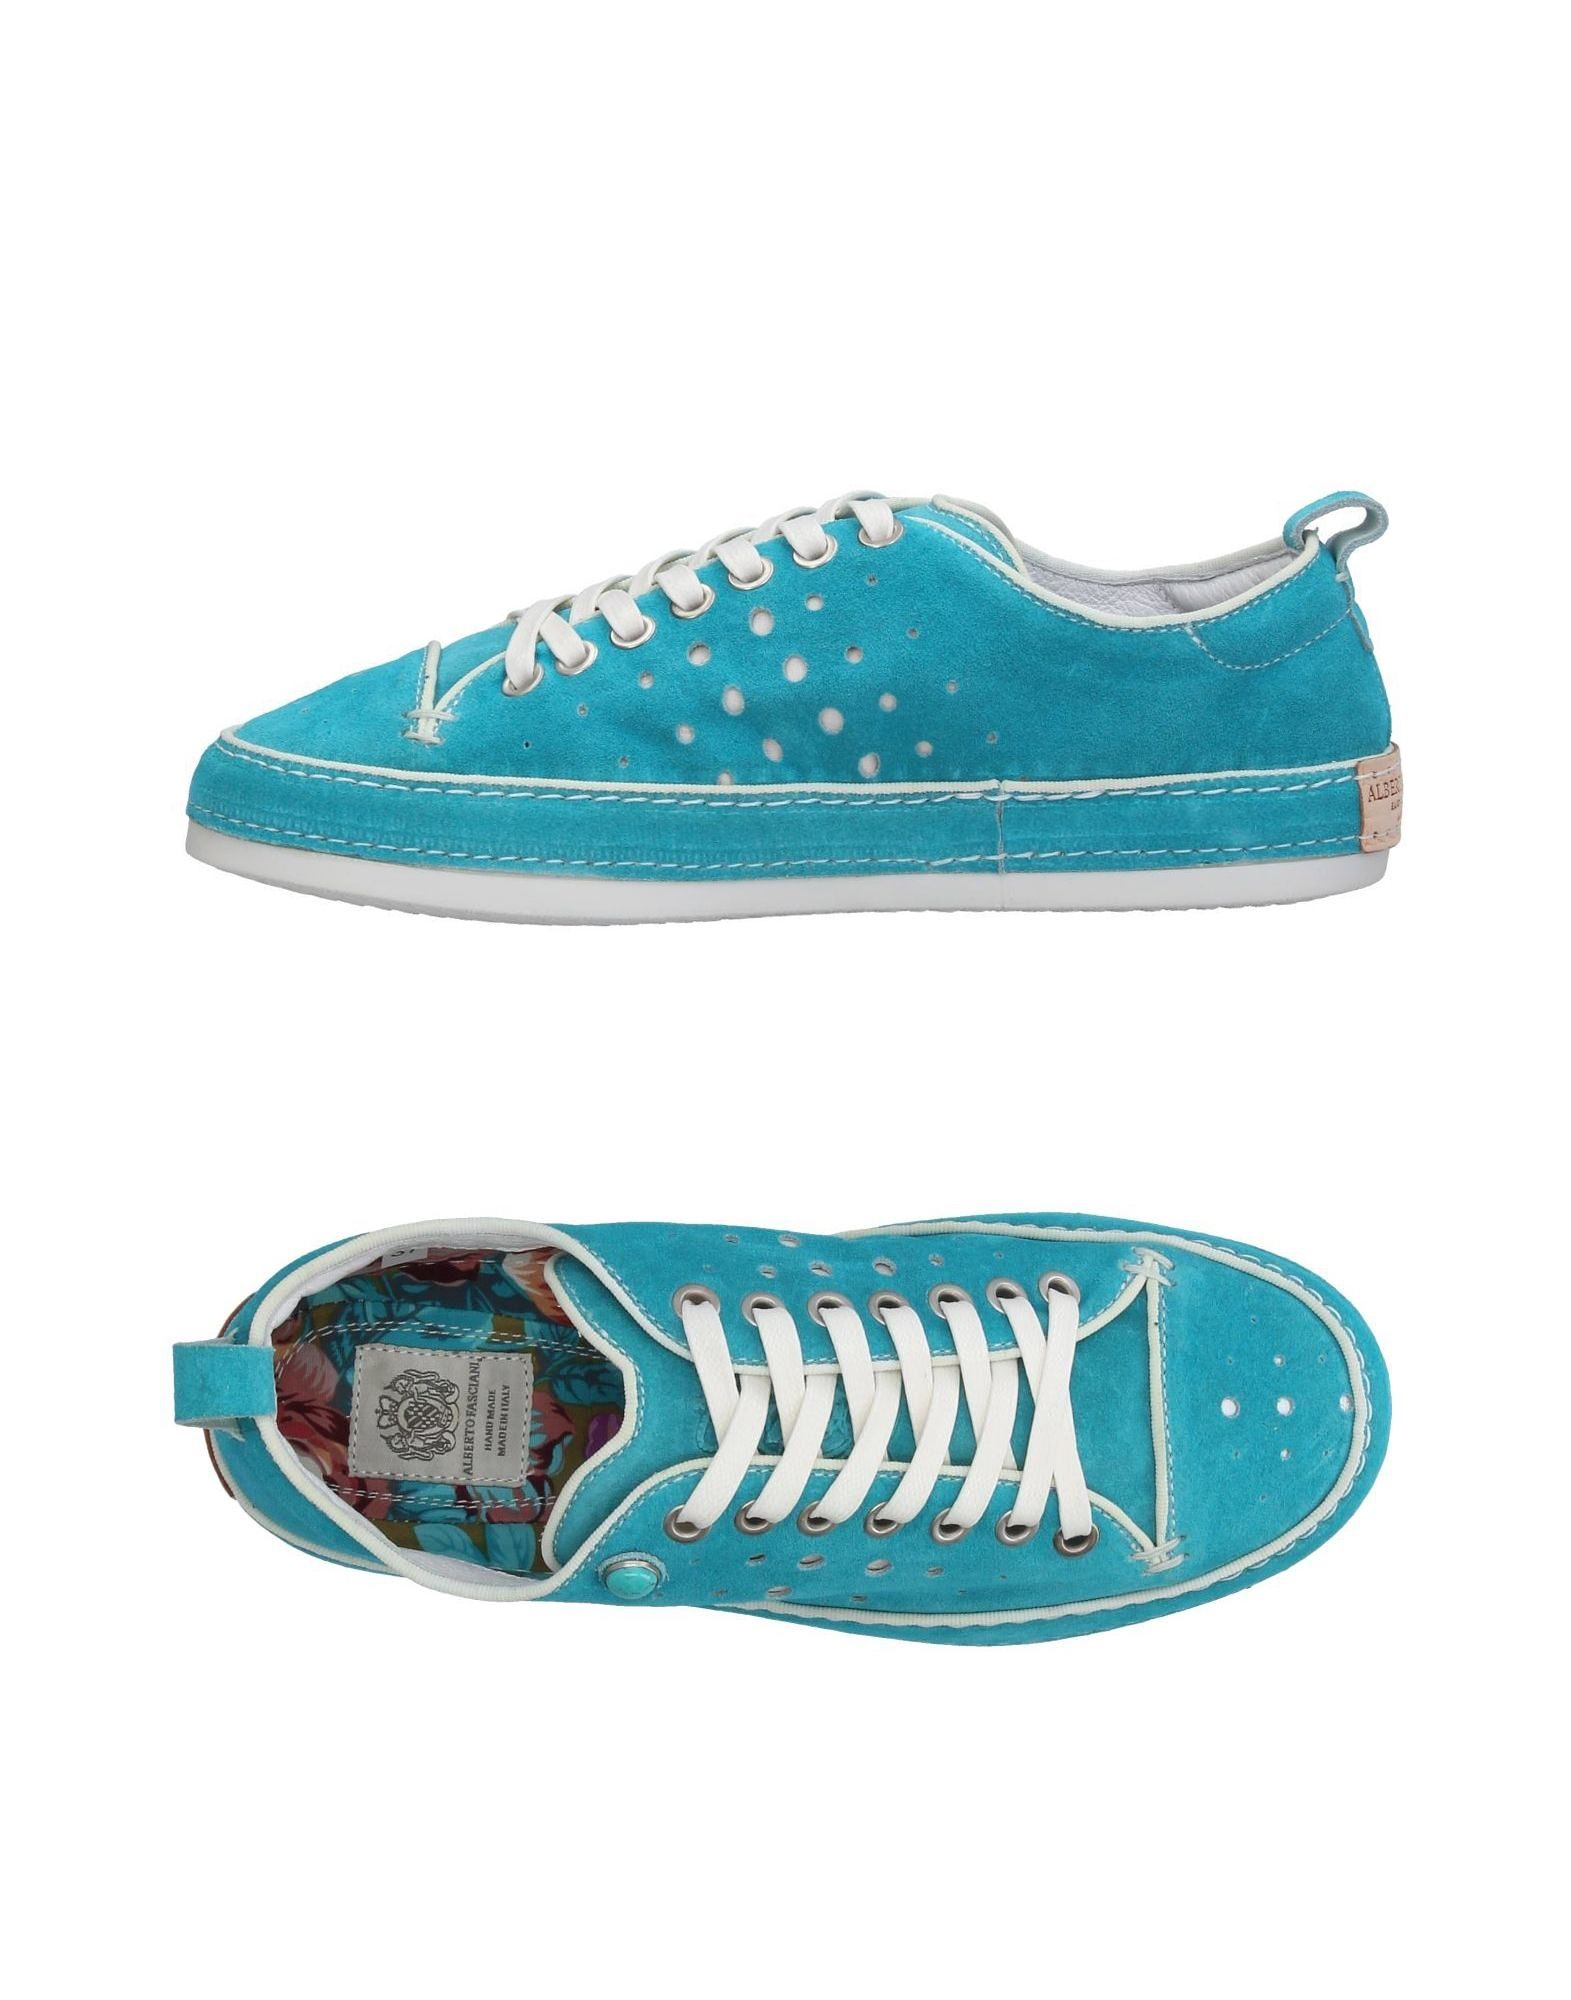 Alberto Fasciani Sneakers Damen  11385768NP Gute Qualität beliebte Schuhe